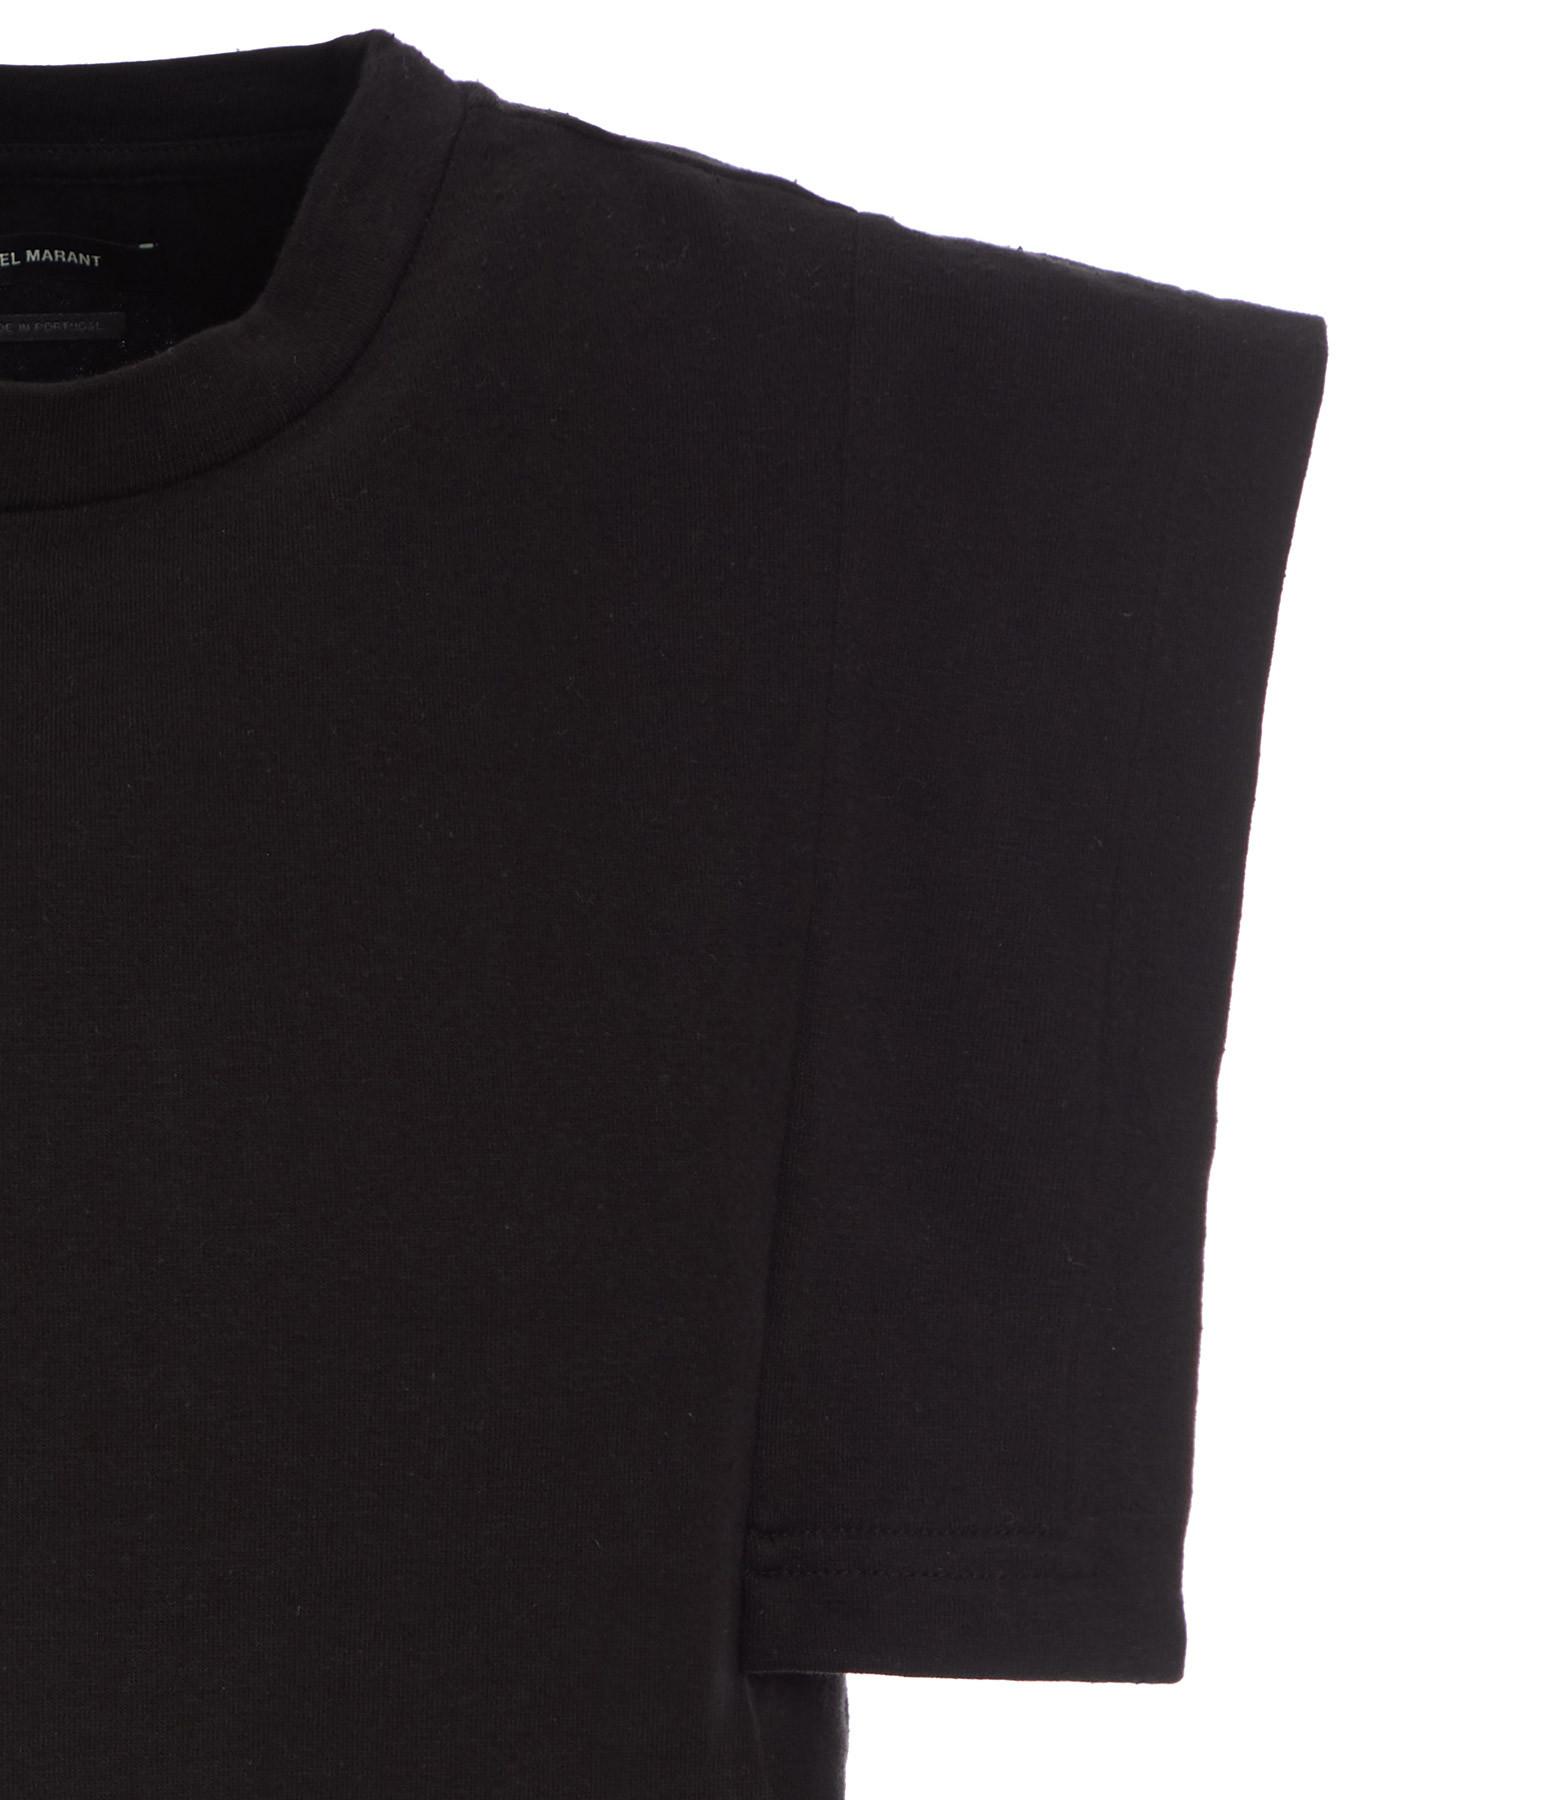 ISABEL MARANT - Tee-shirt Zelipa Coton Noir